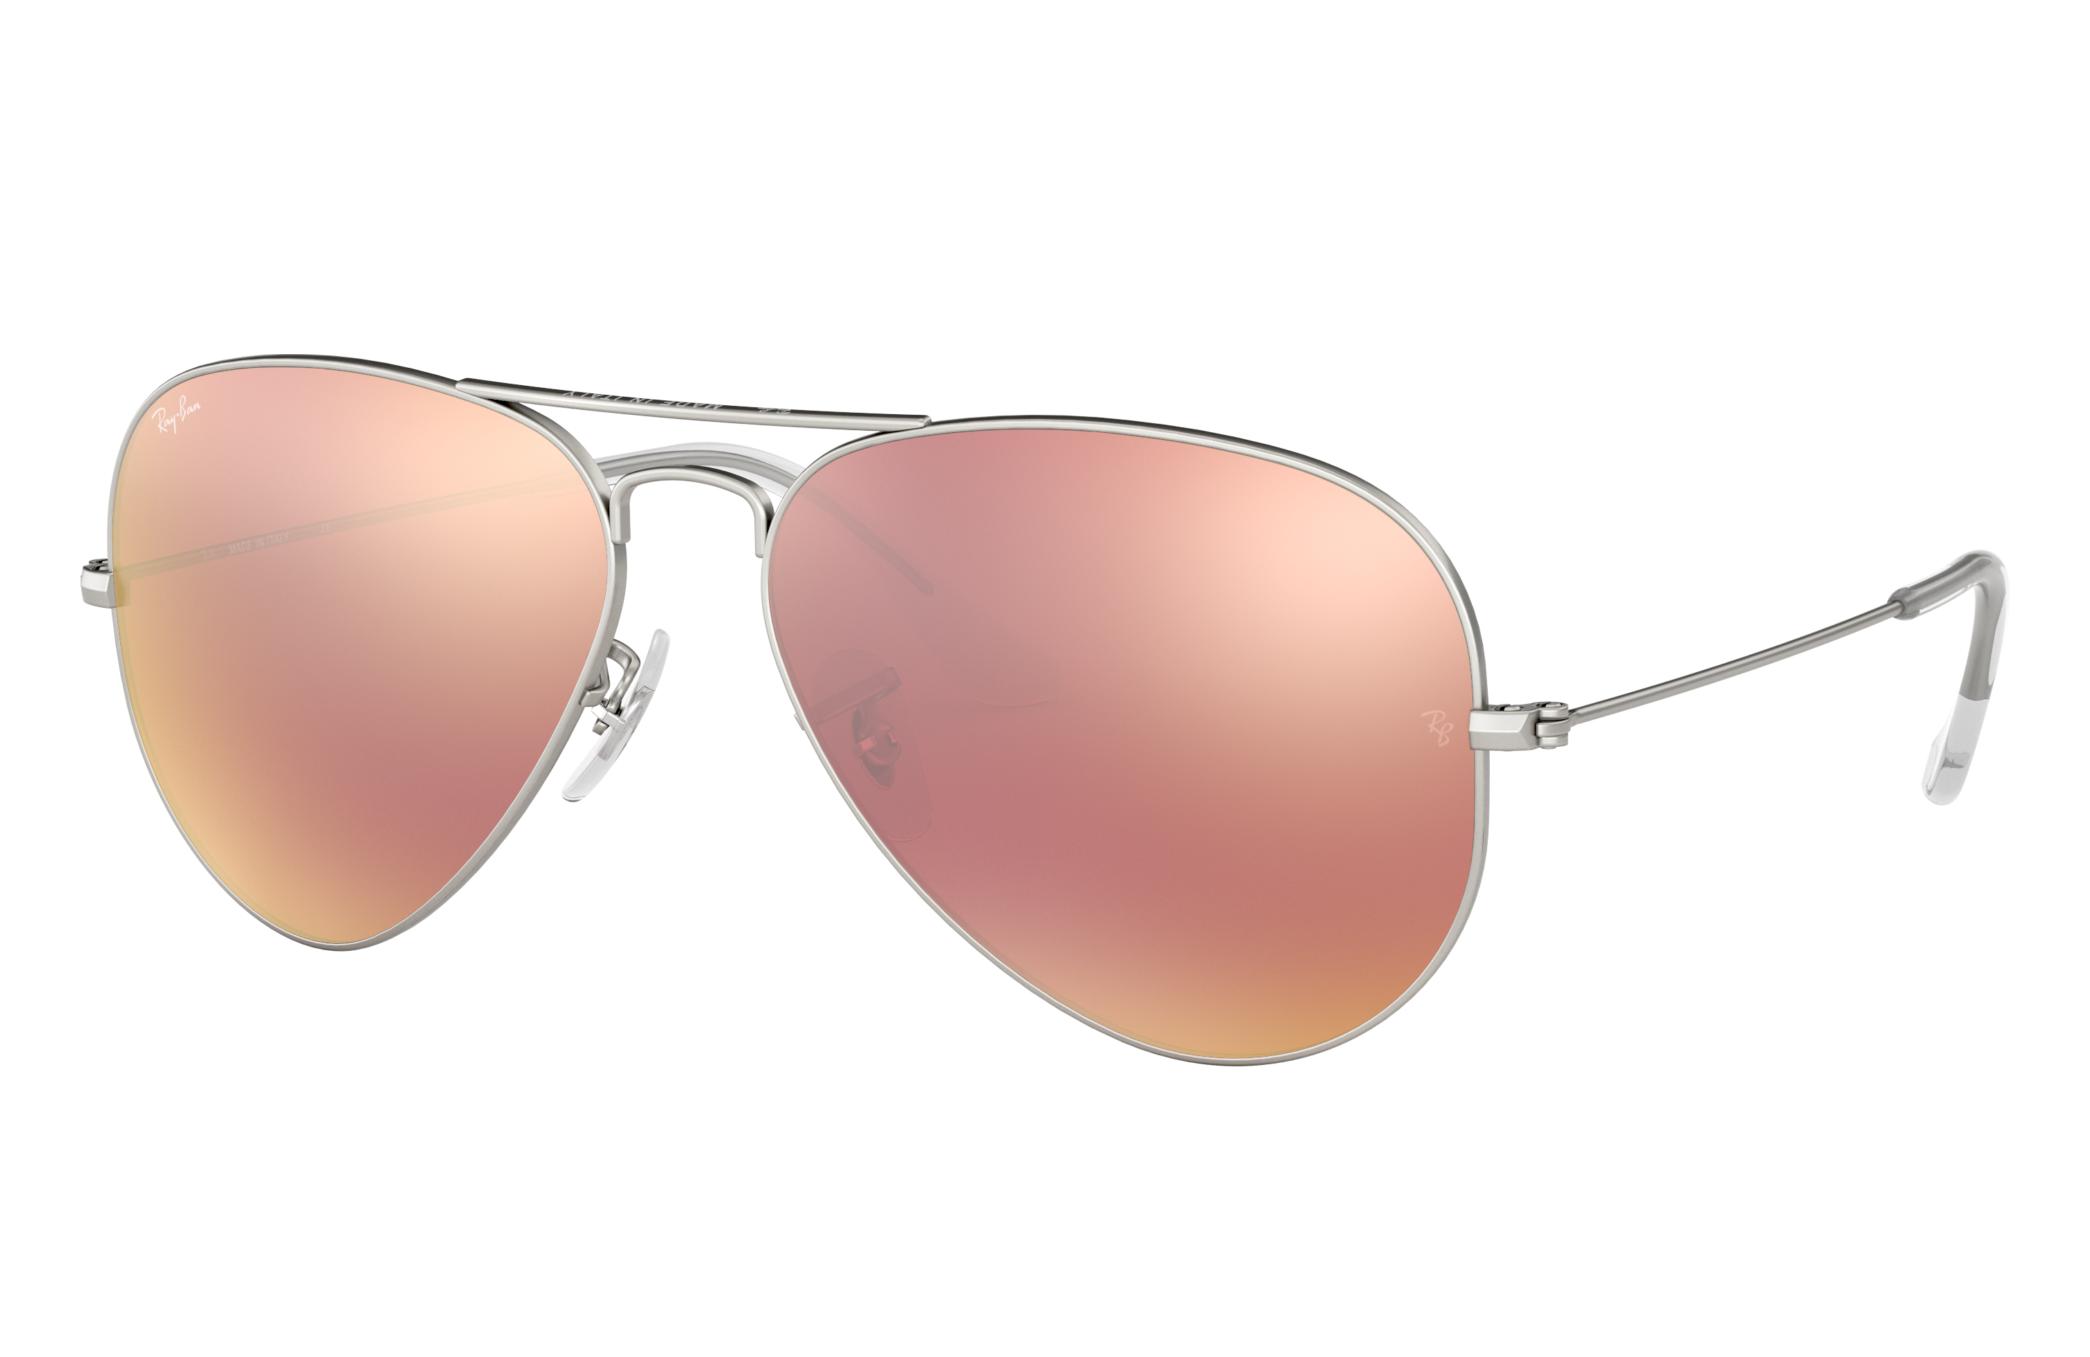 Ray-Ban Aviator Flash Lenses Silver, Pink Lenses - RB3025